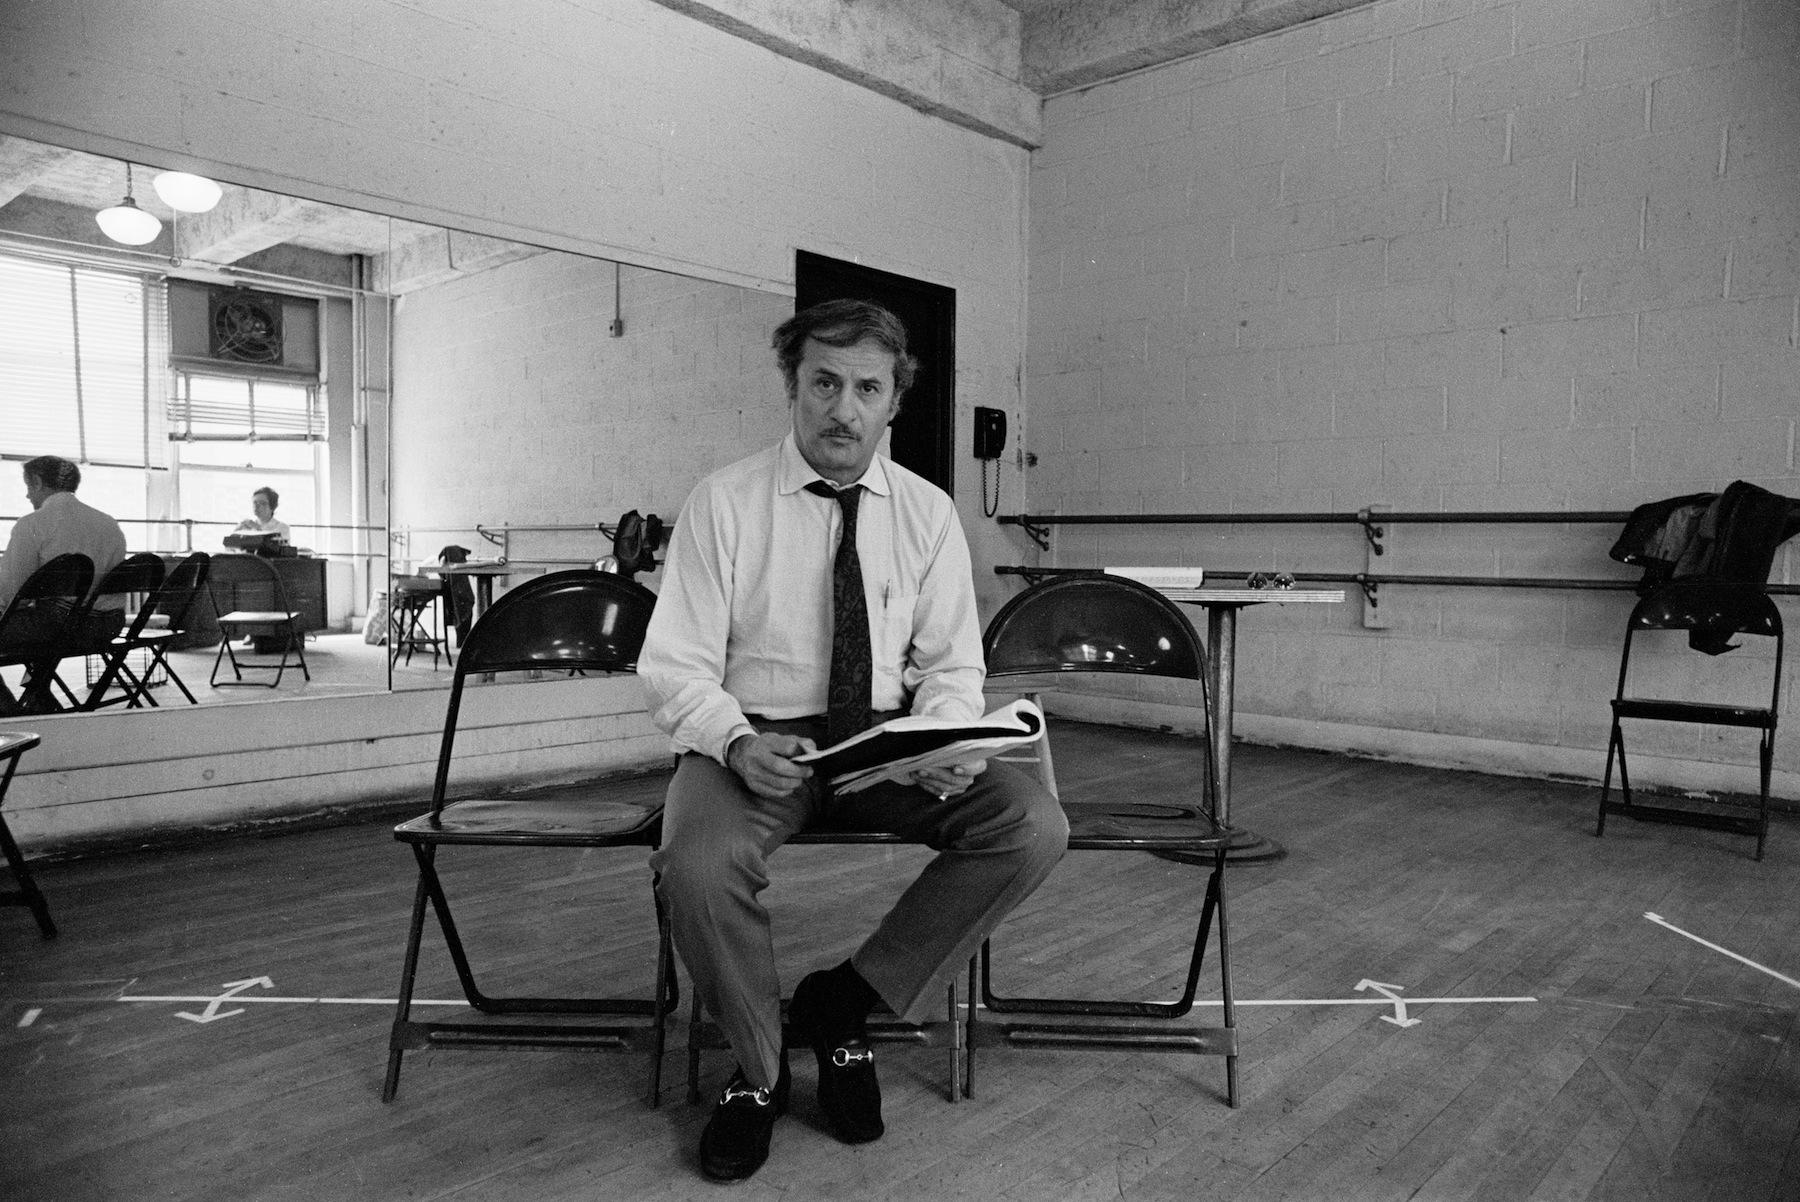 Eli Wallach rehearsing on May 17,1971, in New York, New York.